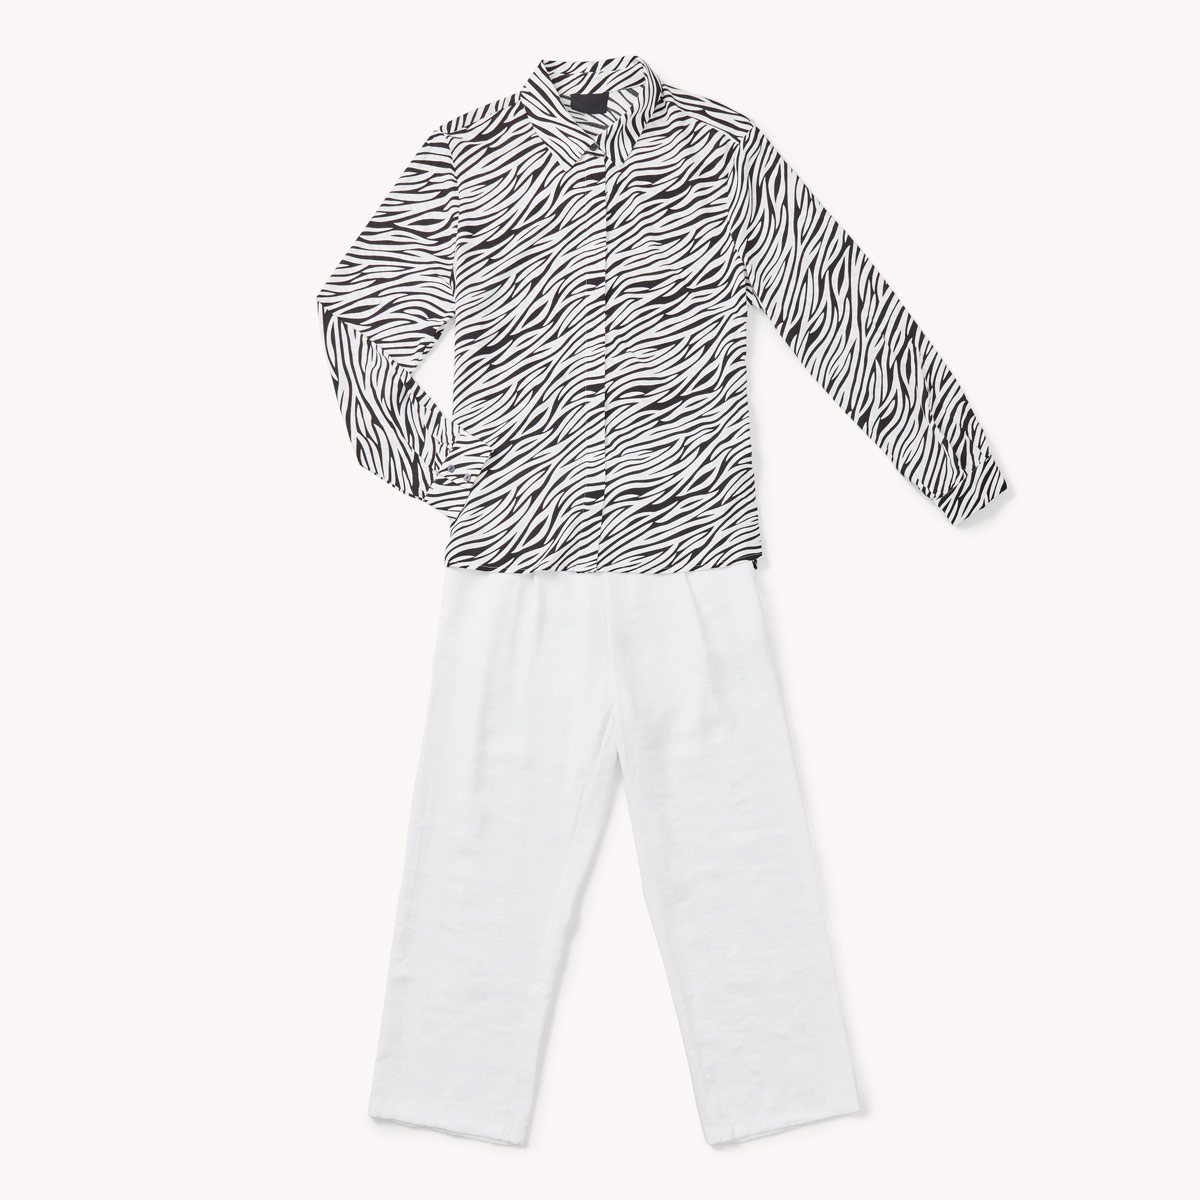 blusa cebra y pantalón blanco tendencia black and white